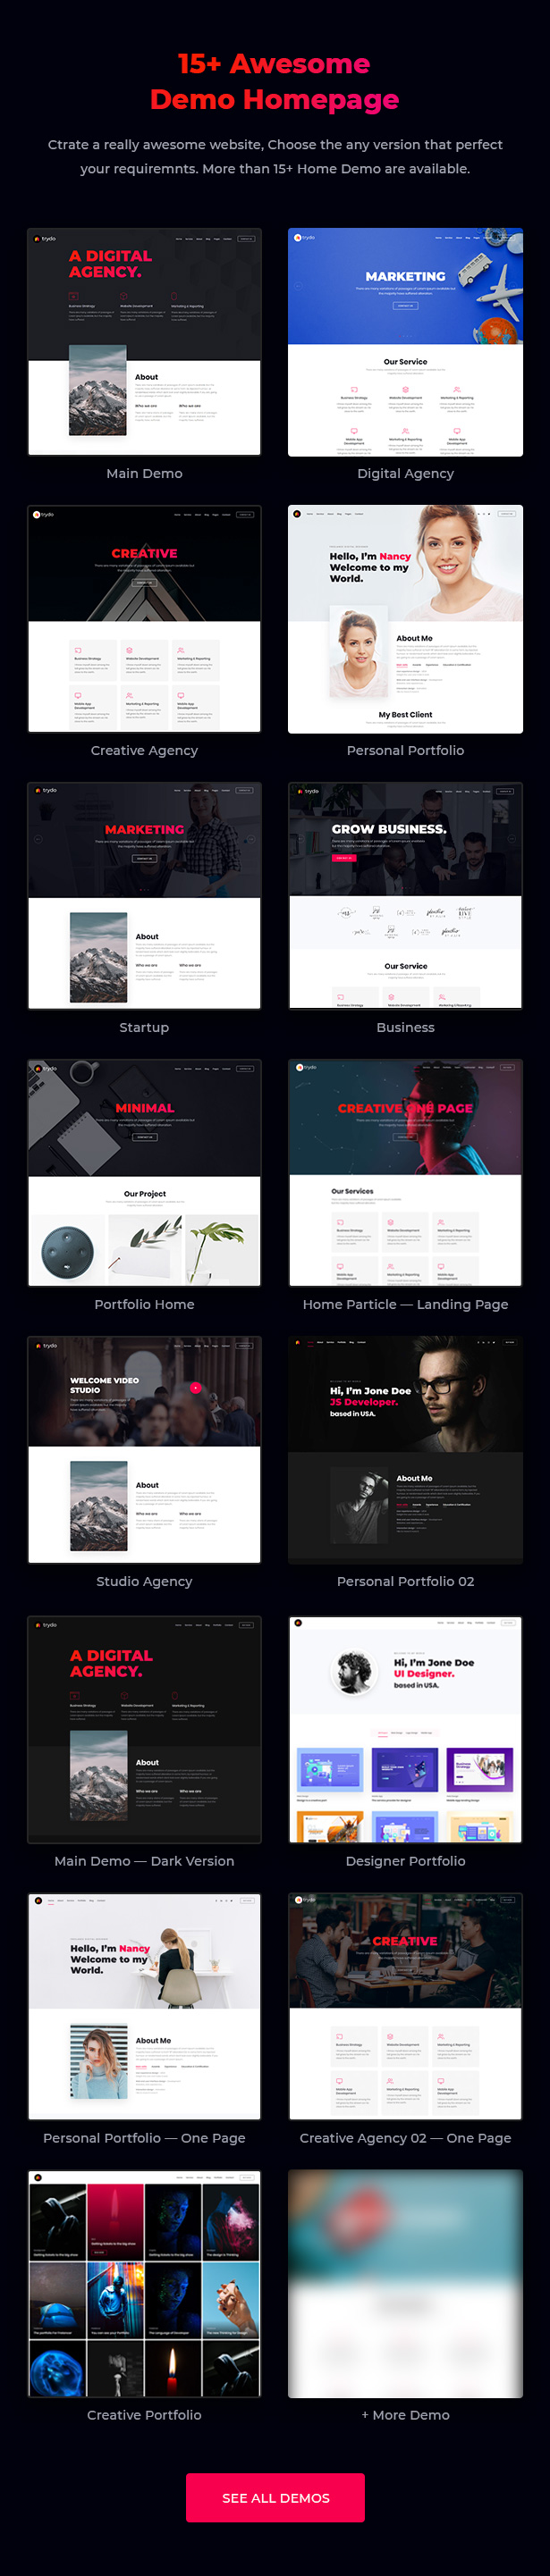 Trydo - Creative Agency and Portfolio Bootstrap Template - 7